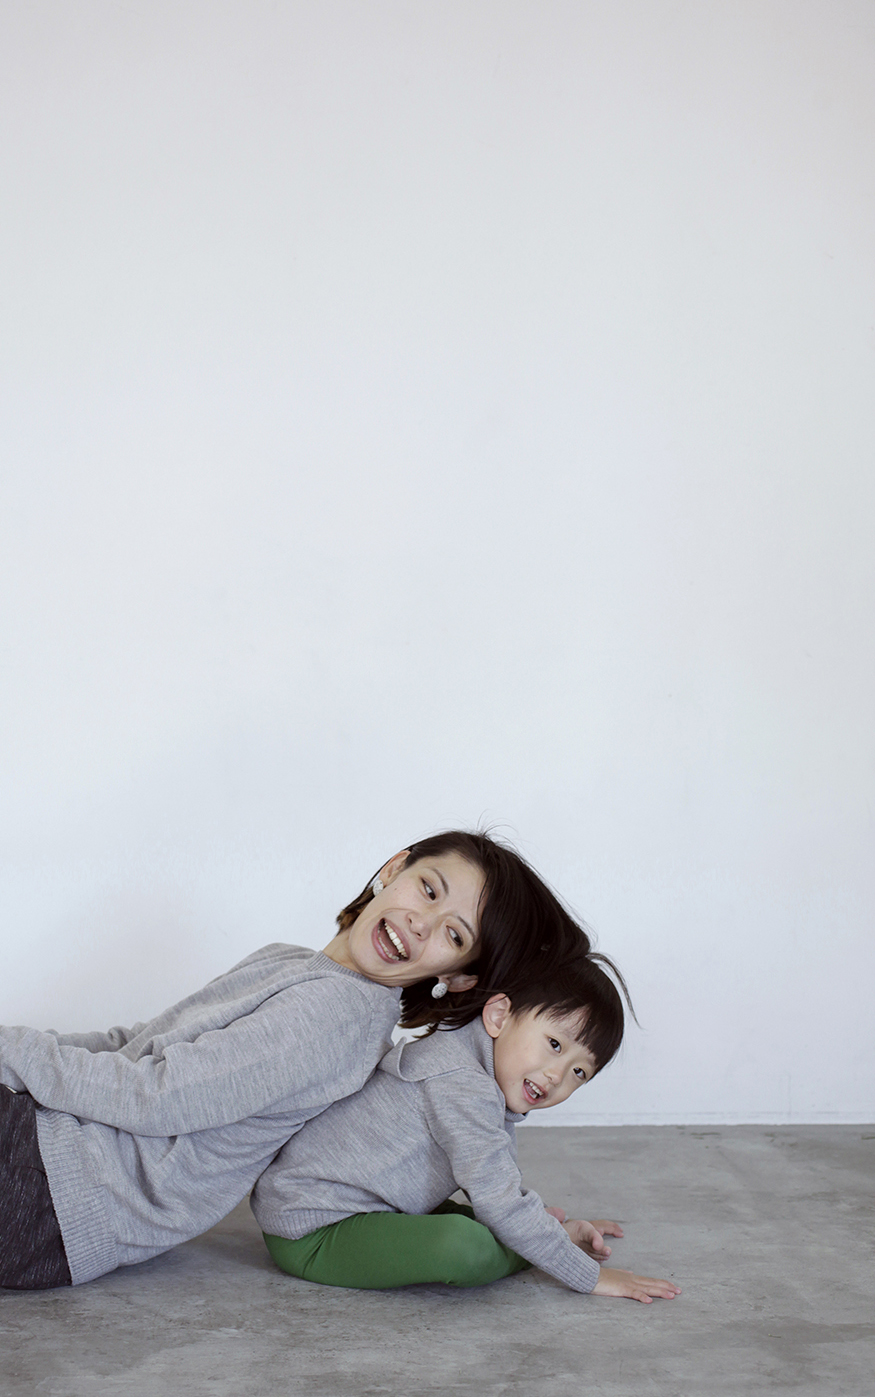 Camphor カンフル ニット knitwear kids こども 子供服 familysweater 日本製 madeinjapan